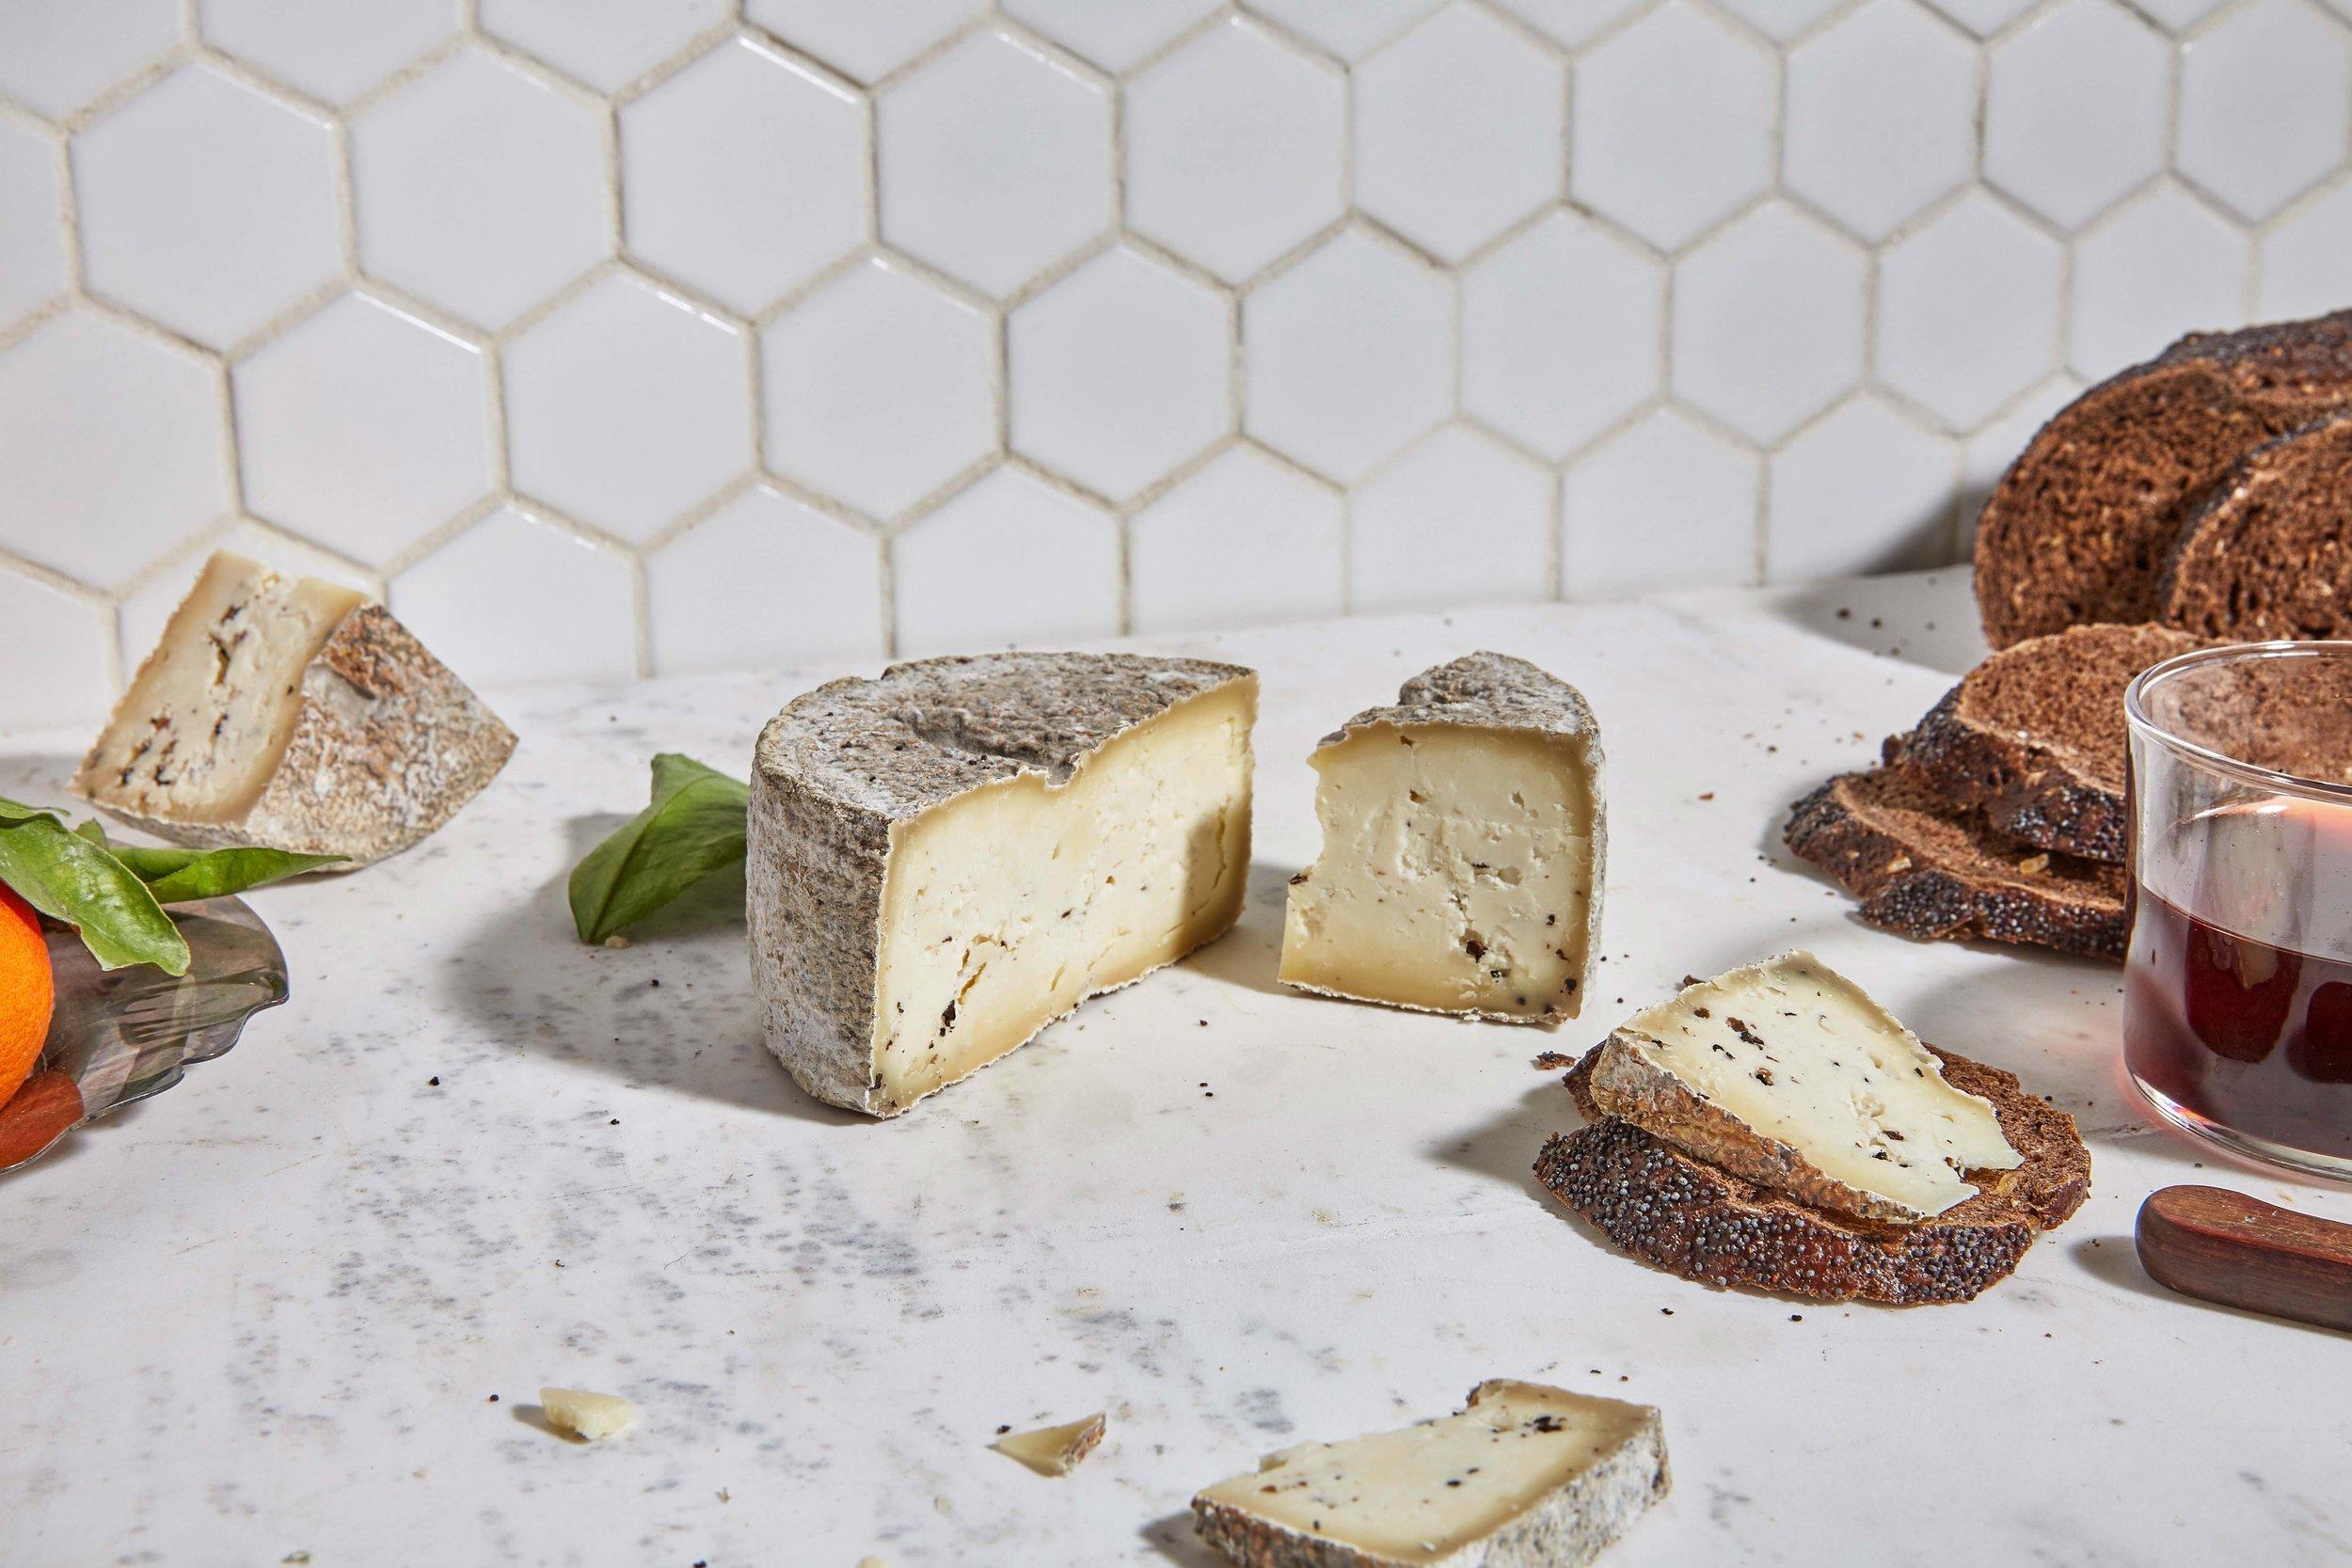 roccolino-truffle-3.jpg